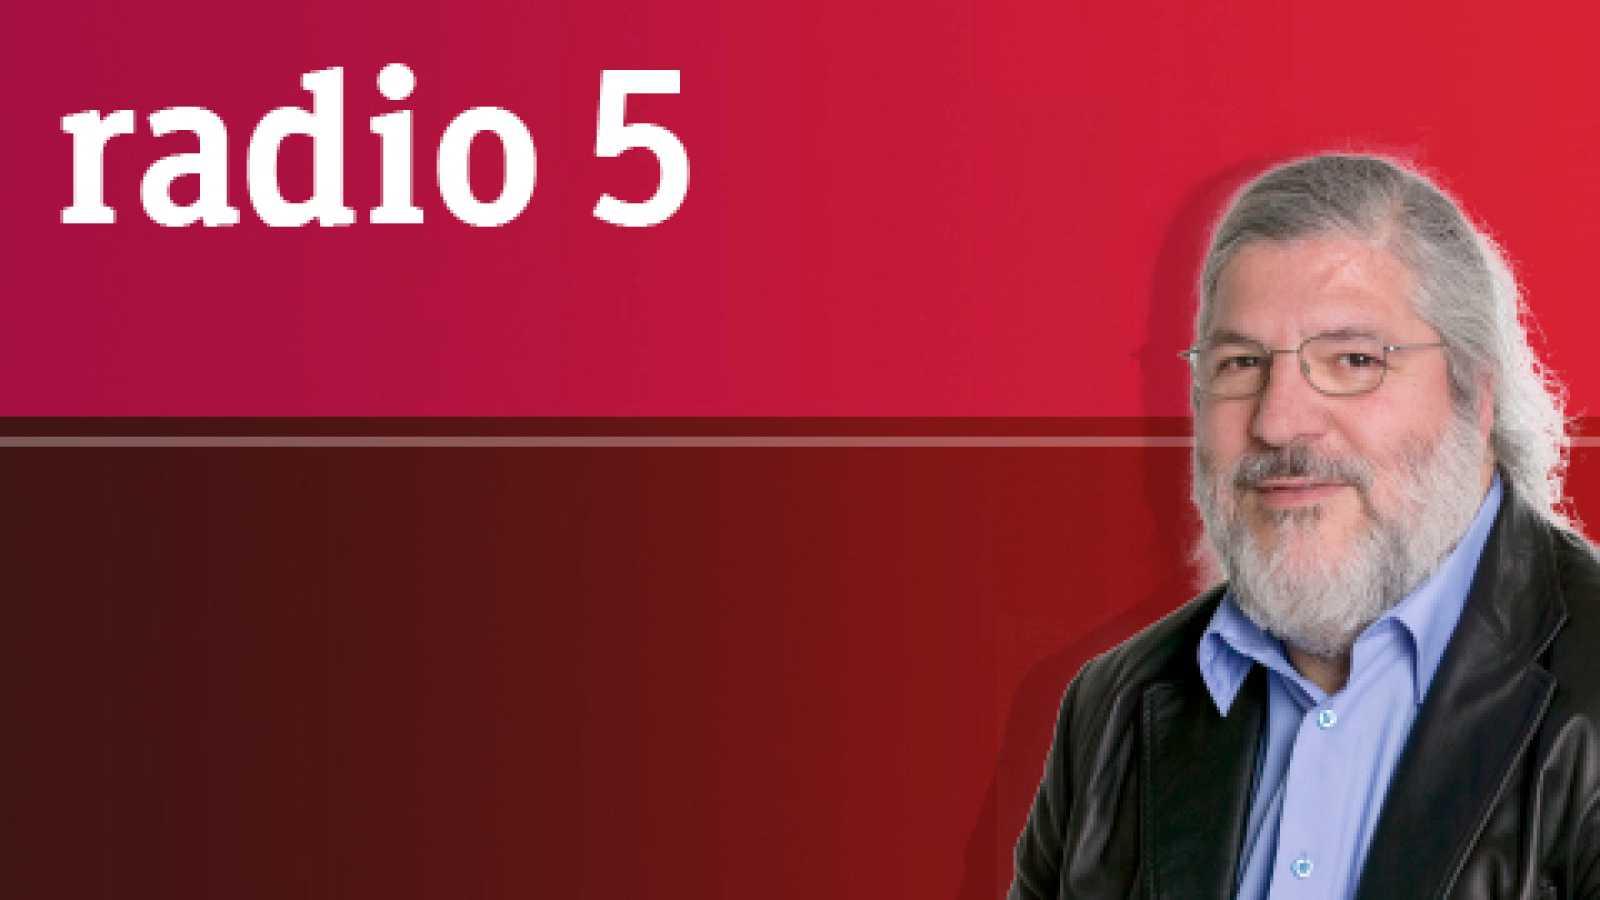 Flamenco en Radio 5 -  'Dos aguas' - segunda parte - 12/02/17 - Escuchar ahora